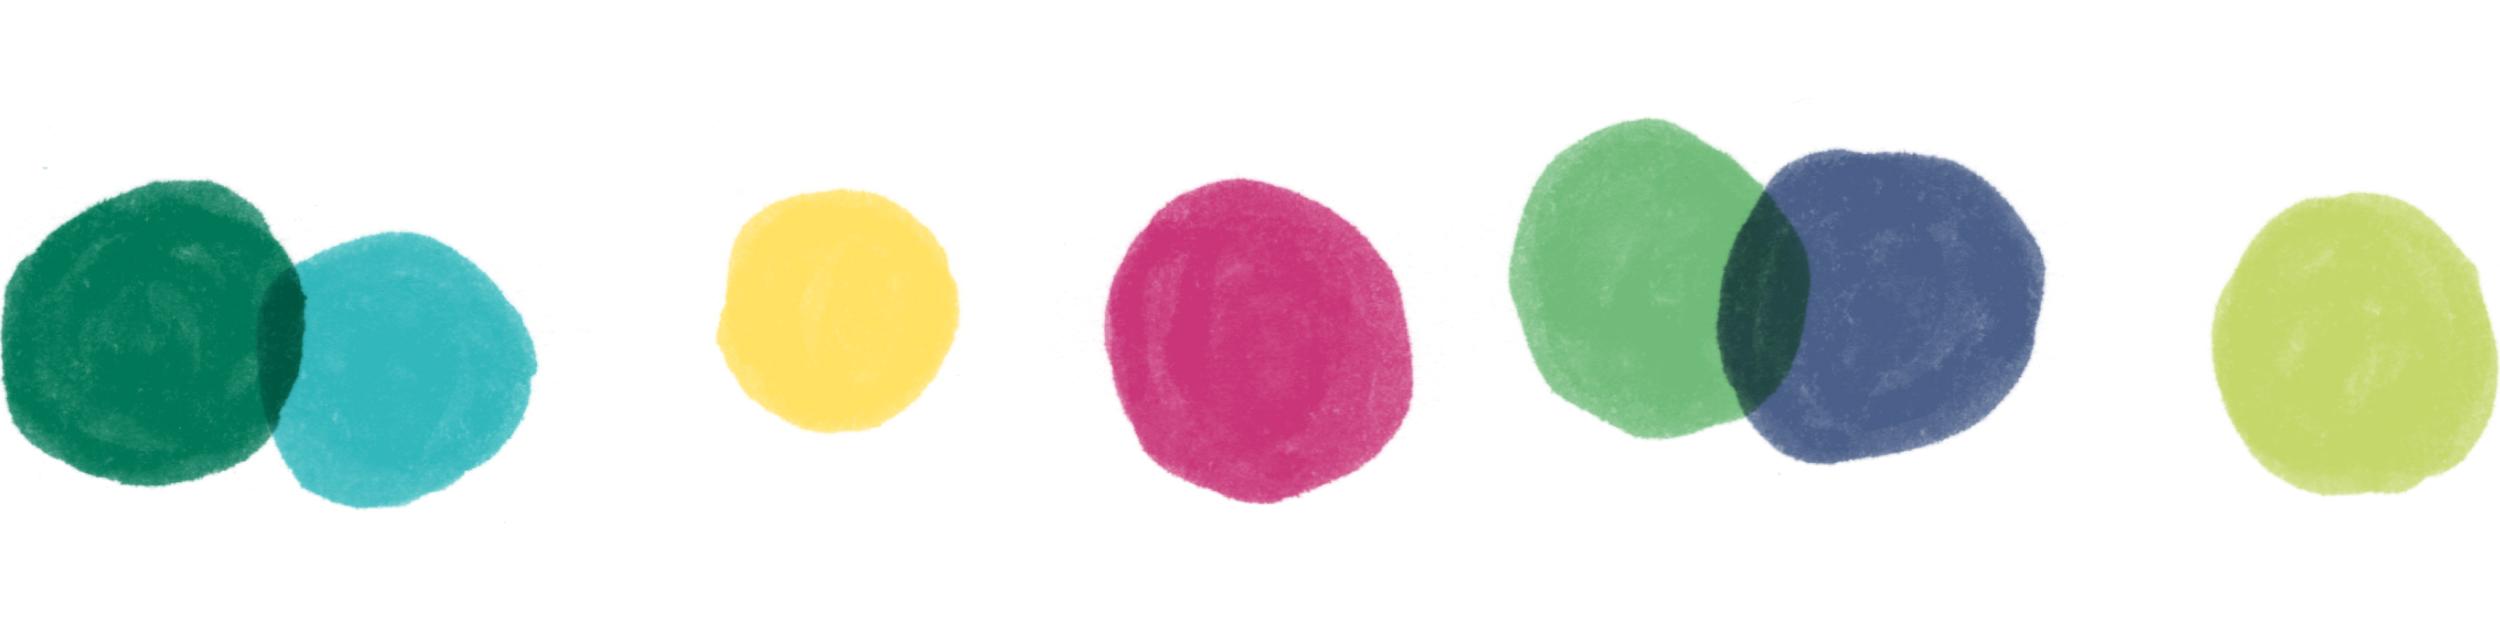 OUR_LIVES_circles_RGB-ONLINE_72dpi_row1